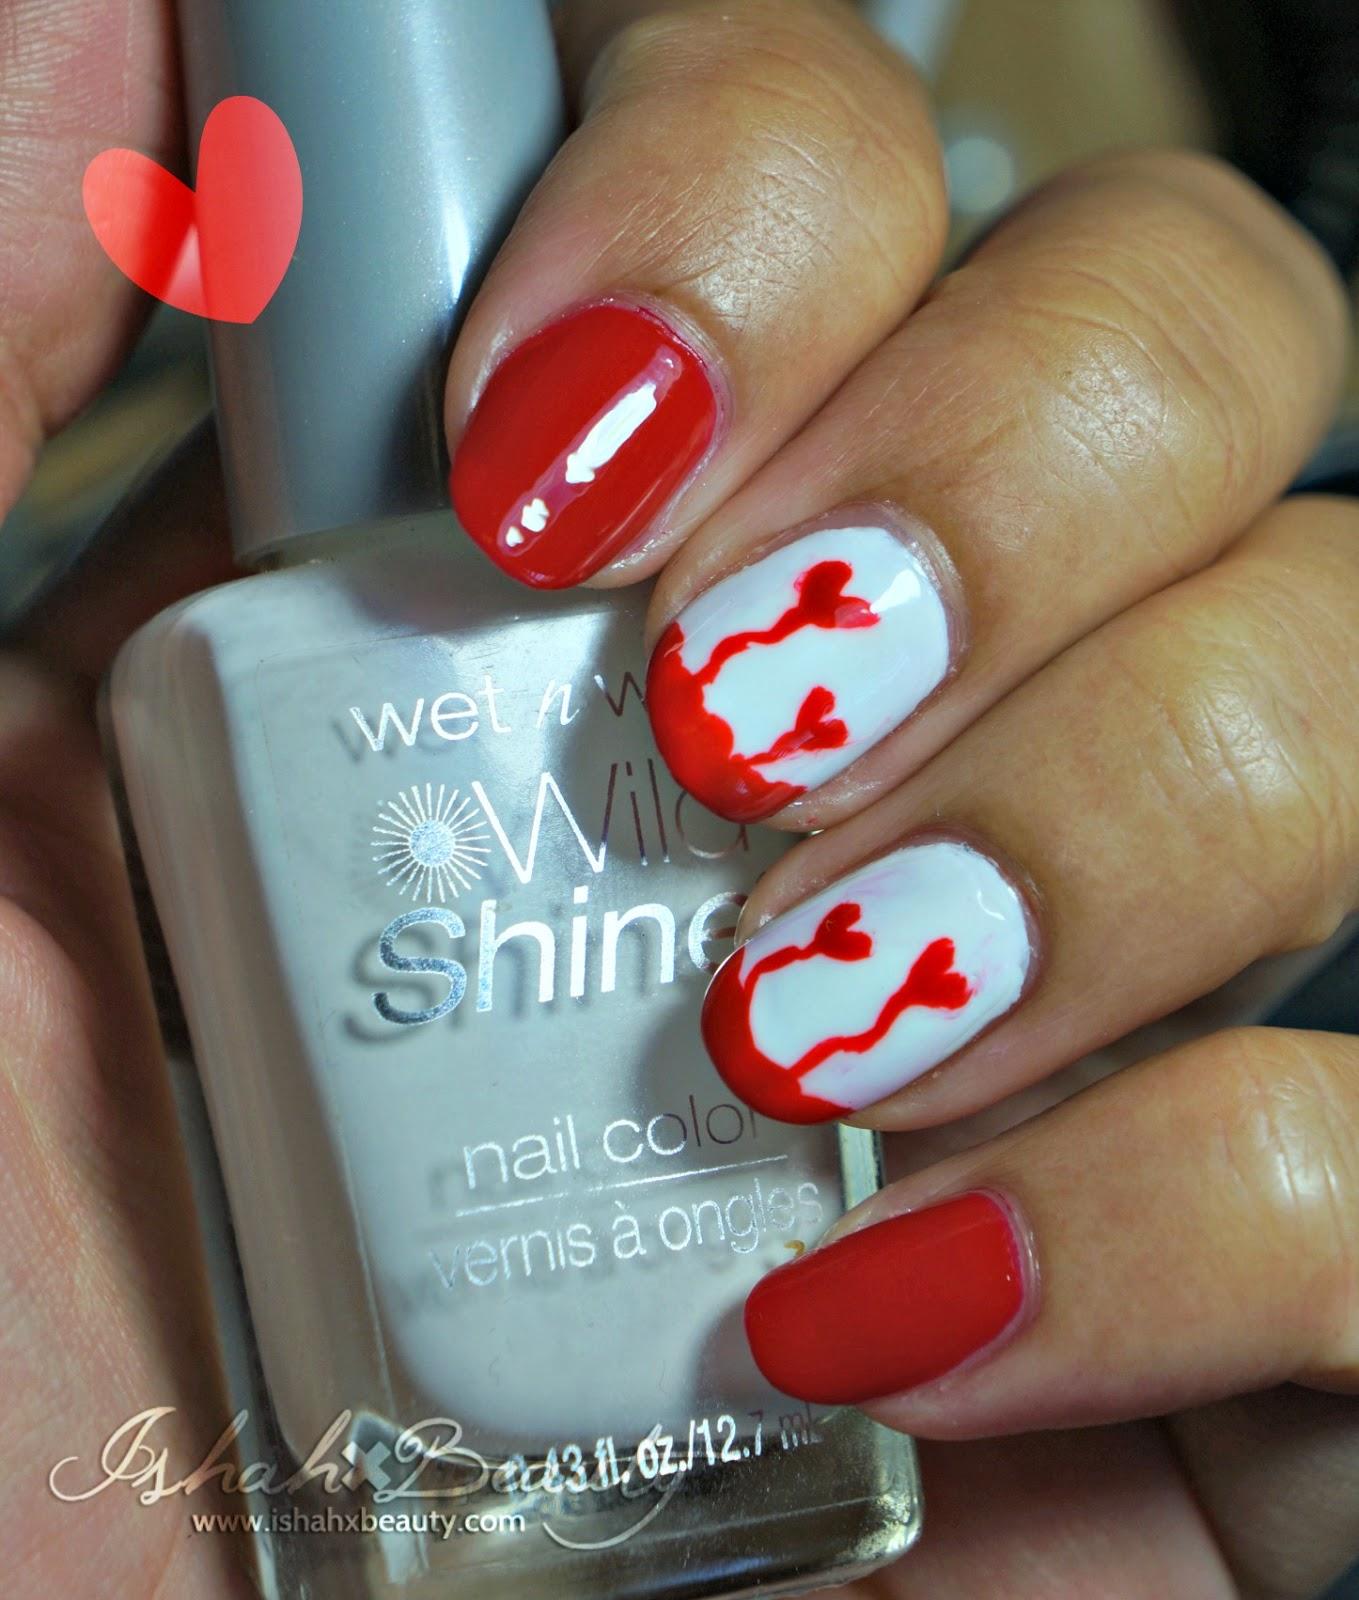 Ishah x Beauty: My Bloody Valentine Drip Heart Nail Art